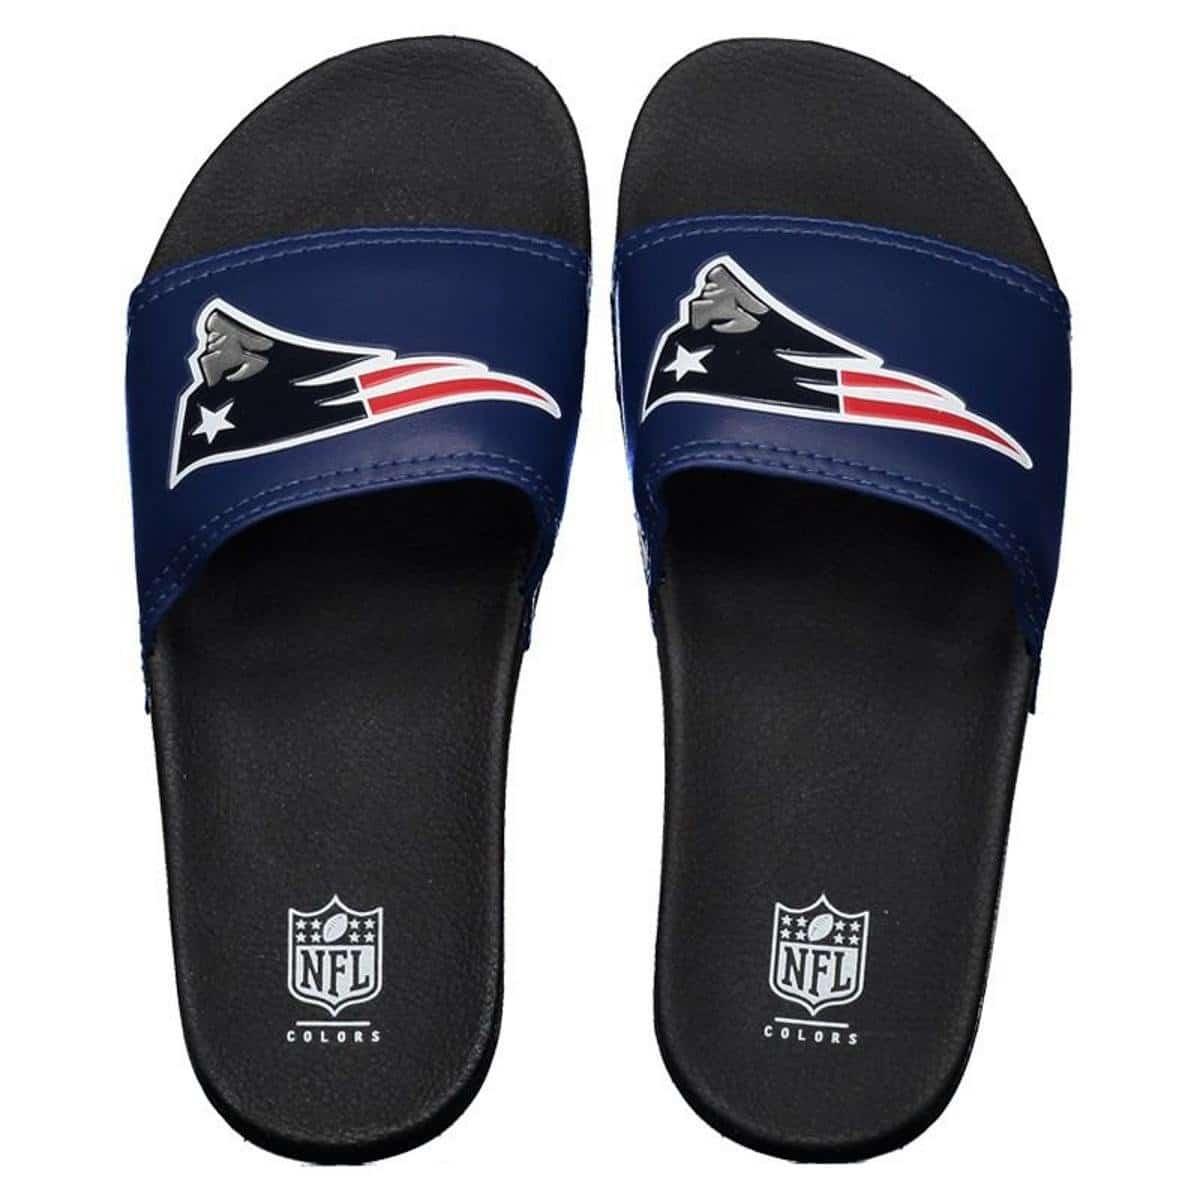 Chinelo do New England Patriots